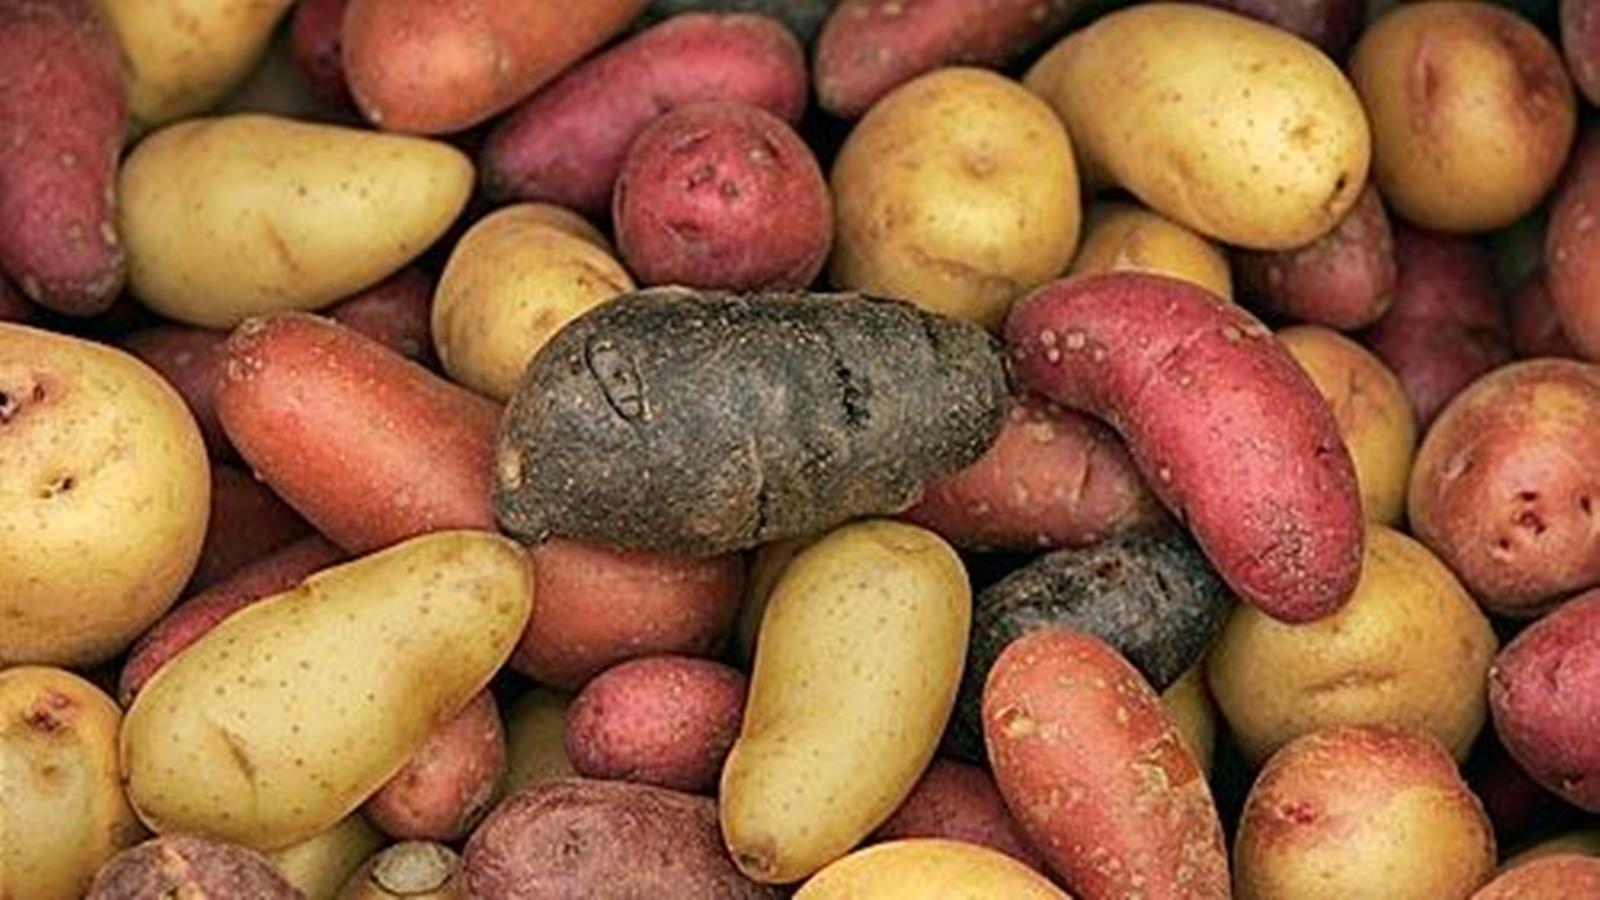 Farmers market report new potatoes are in season here are 9 recipes la times - New potatoes recipes treat ...